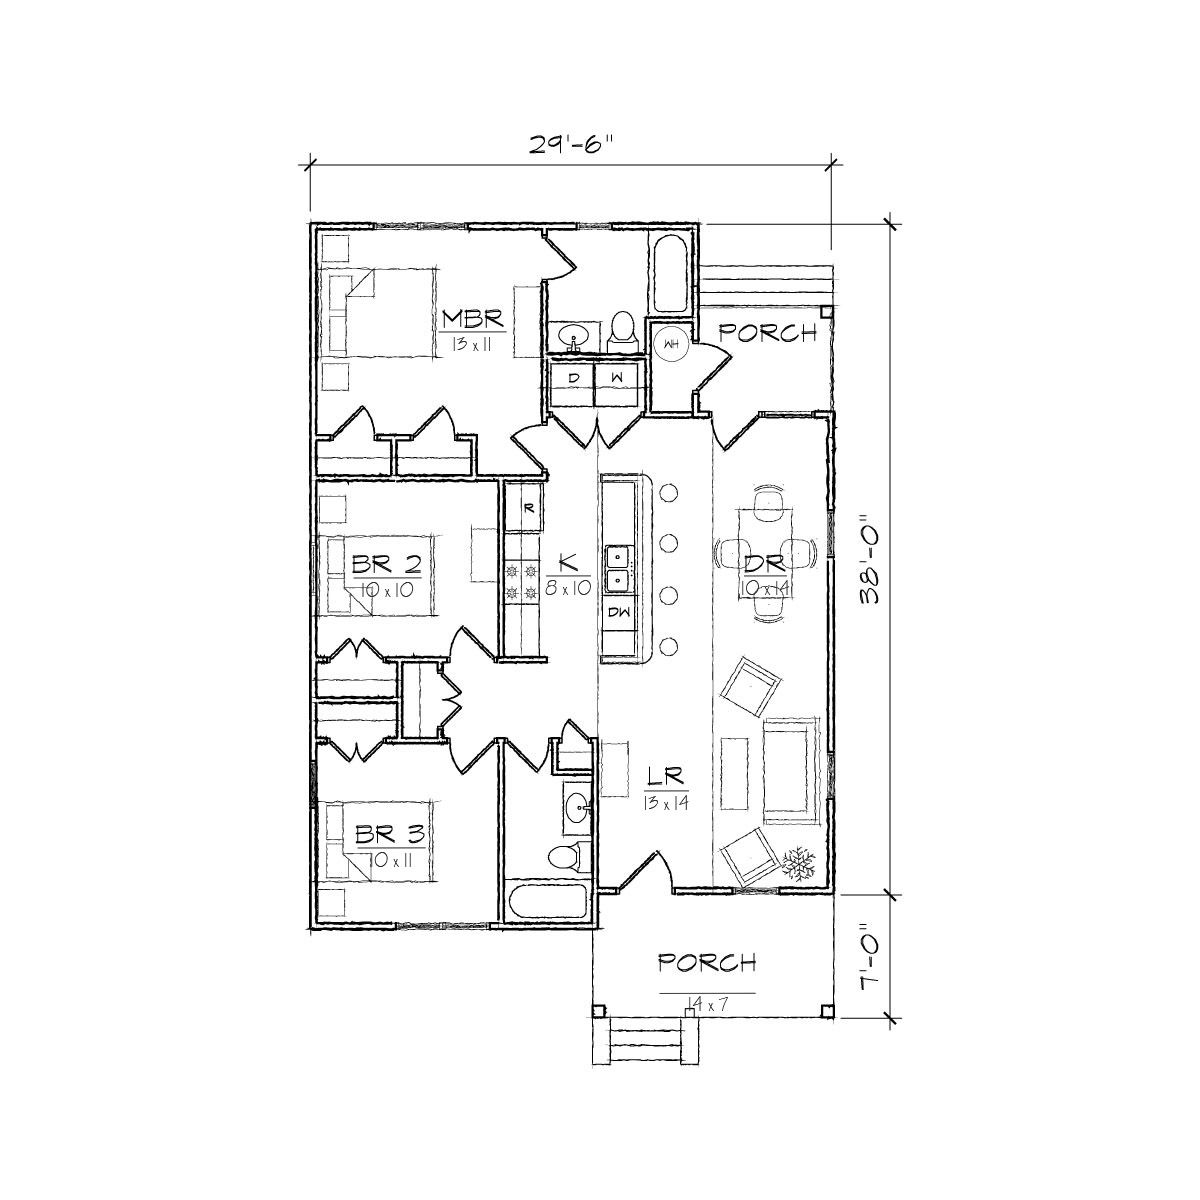 Bungalow Design Floor Plans: Carolinian I Bungalow Floor Plan